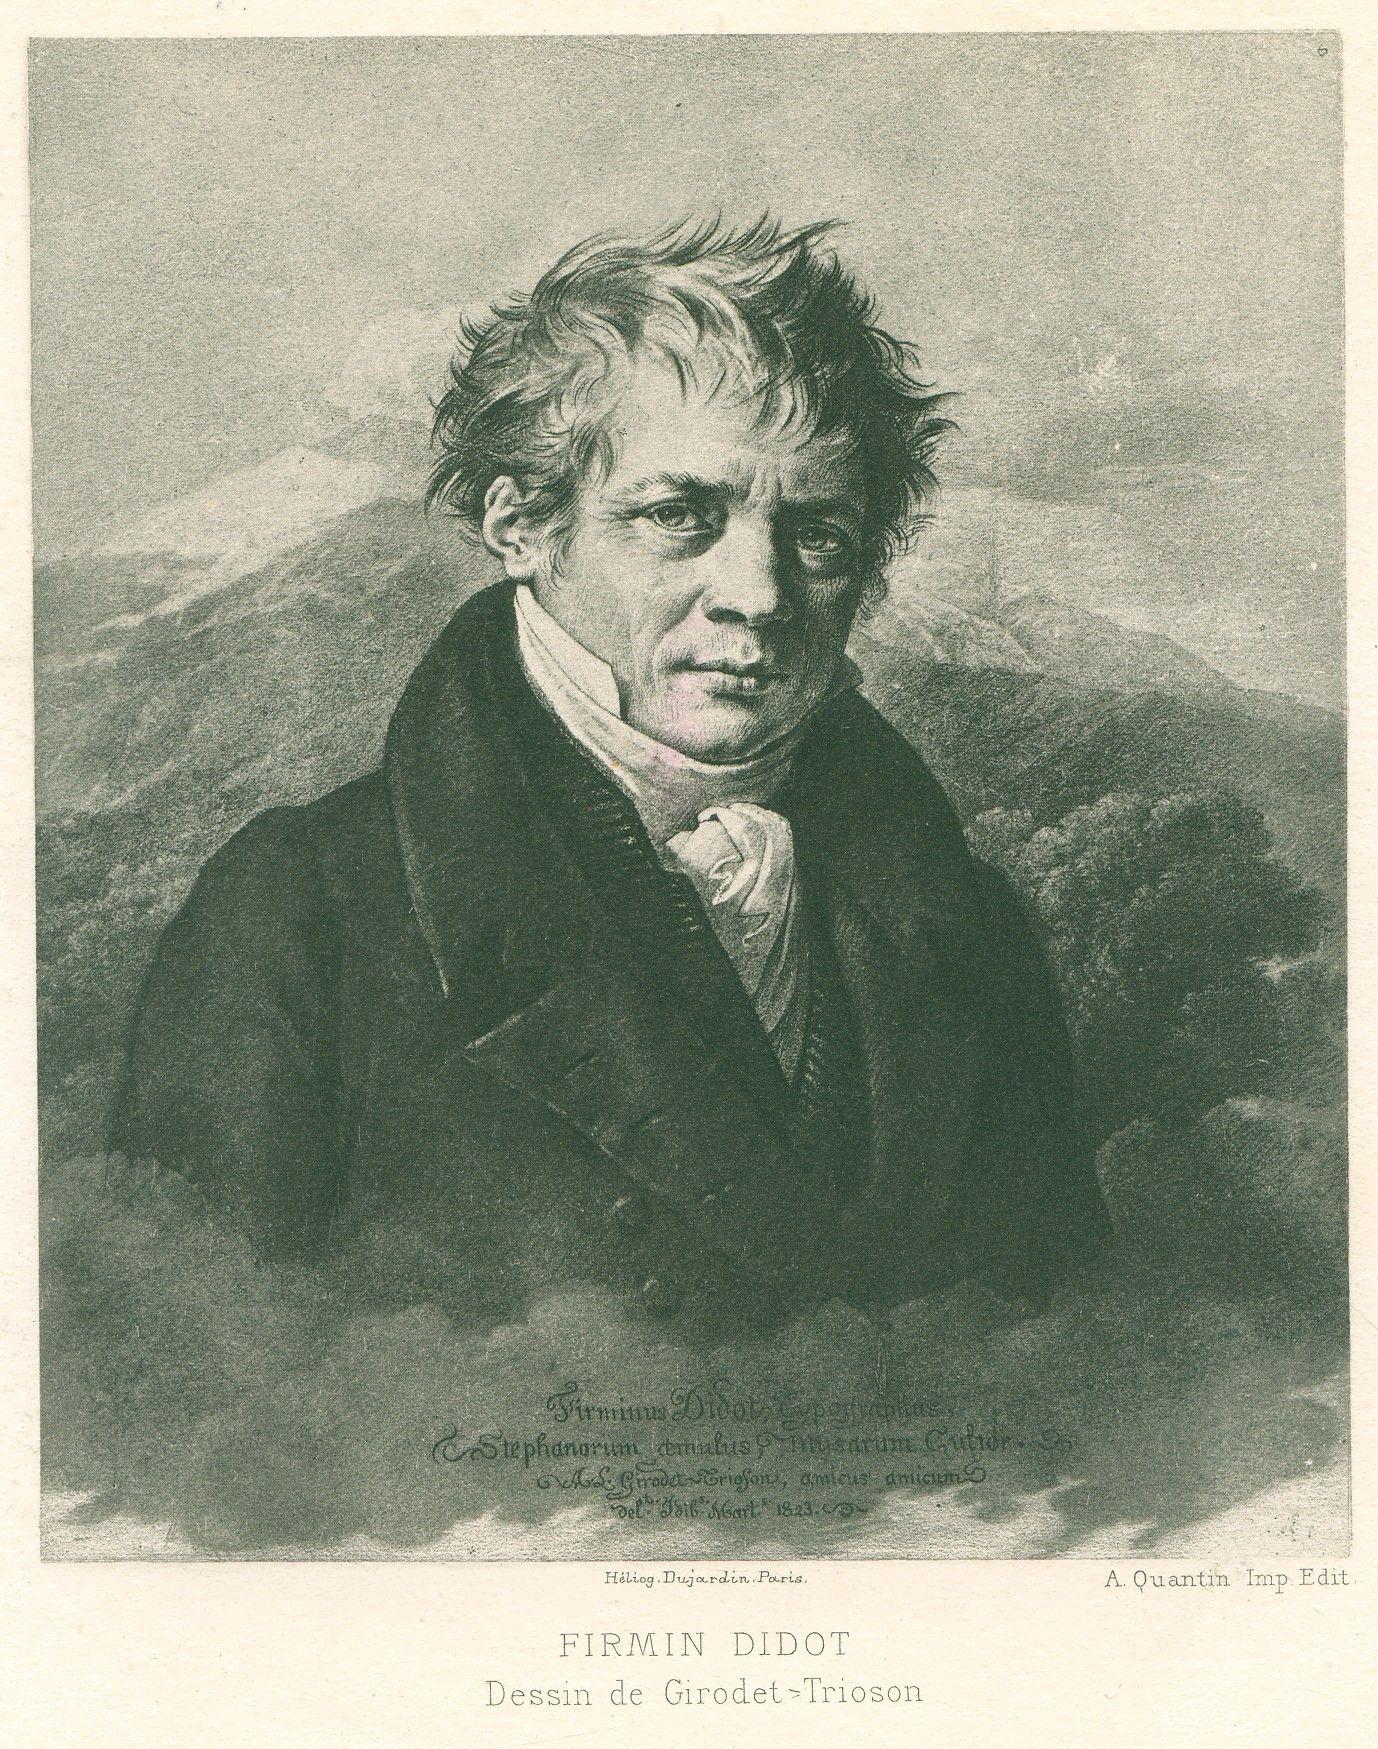 firmin didot 1764-1876